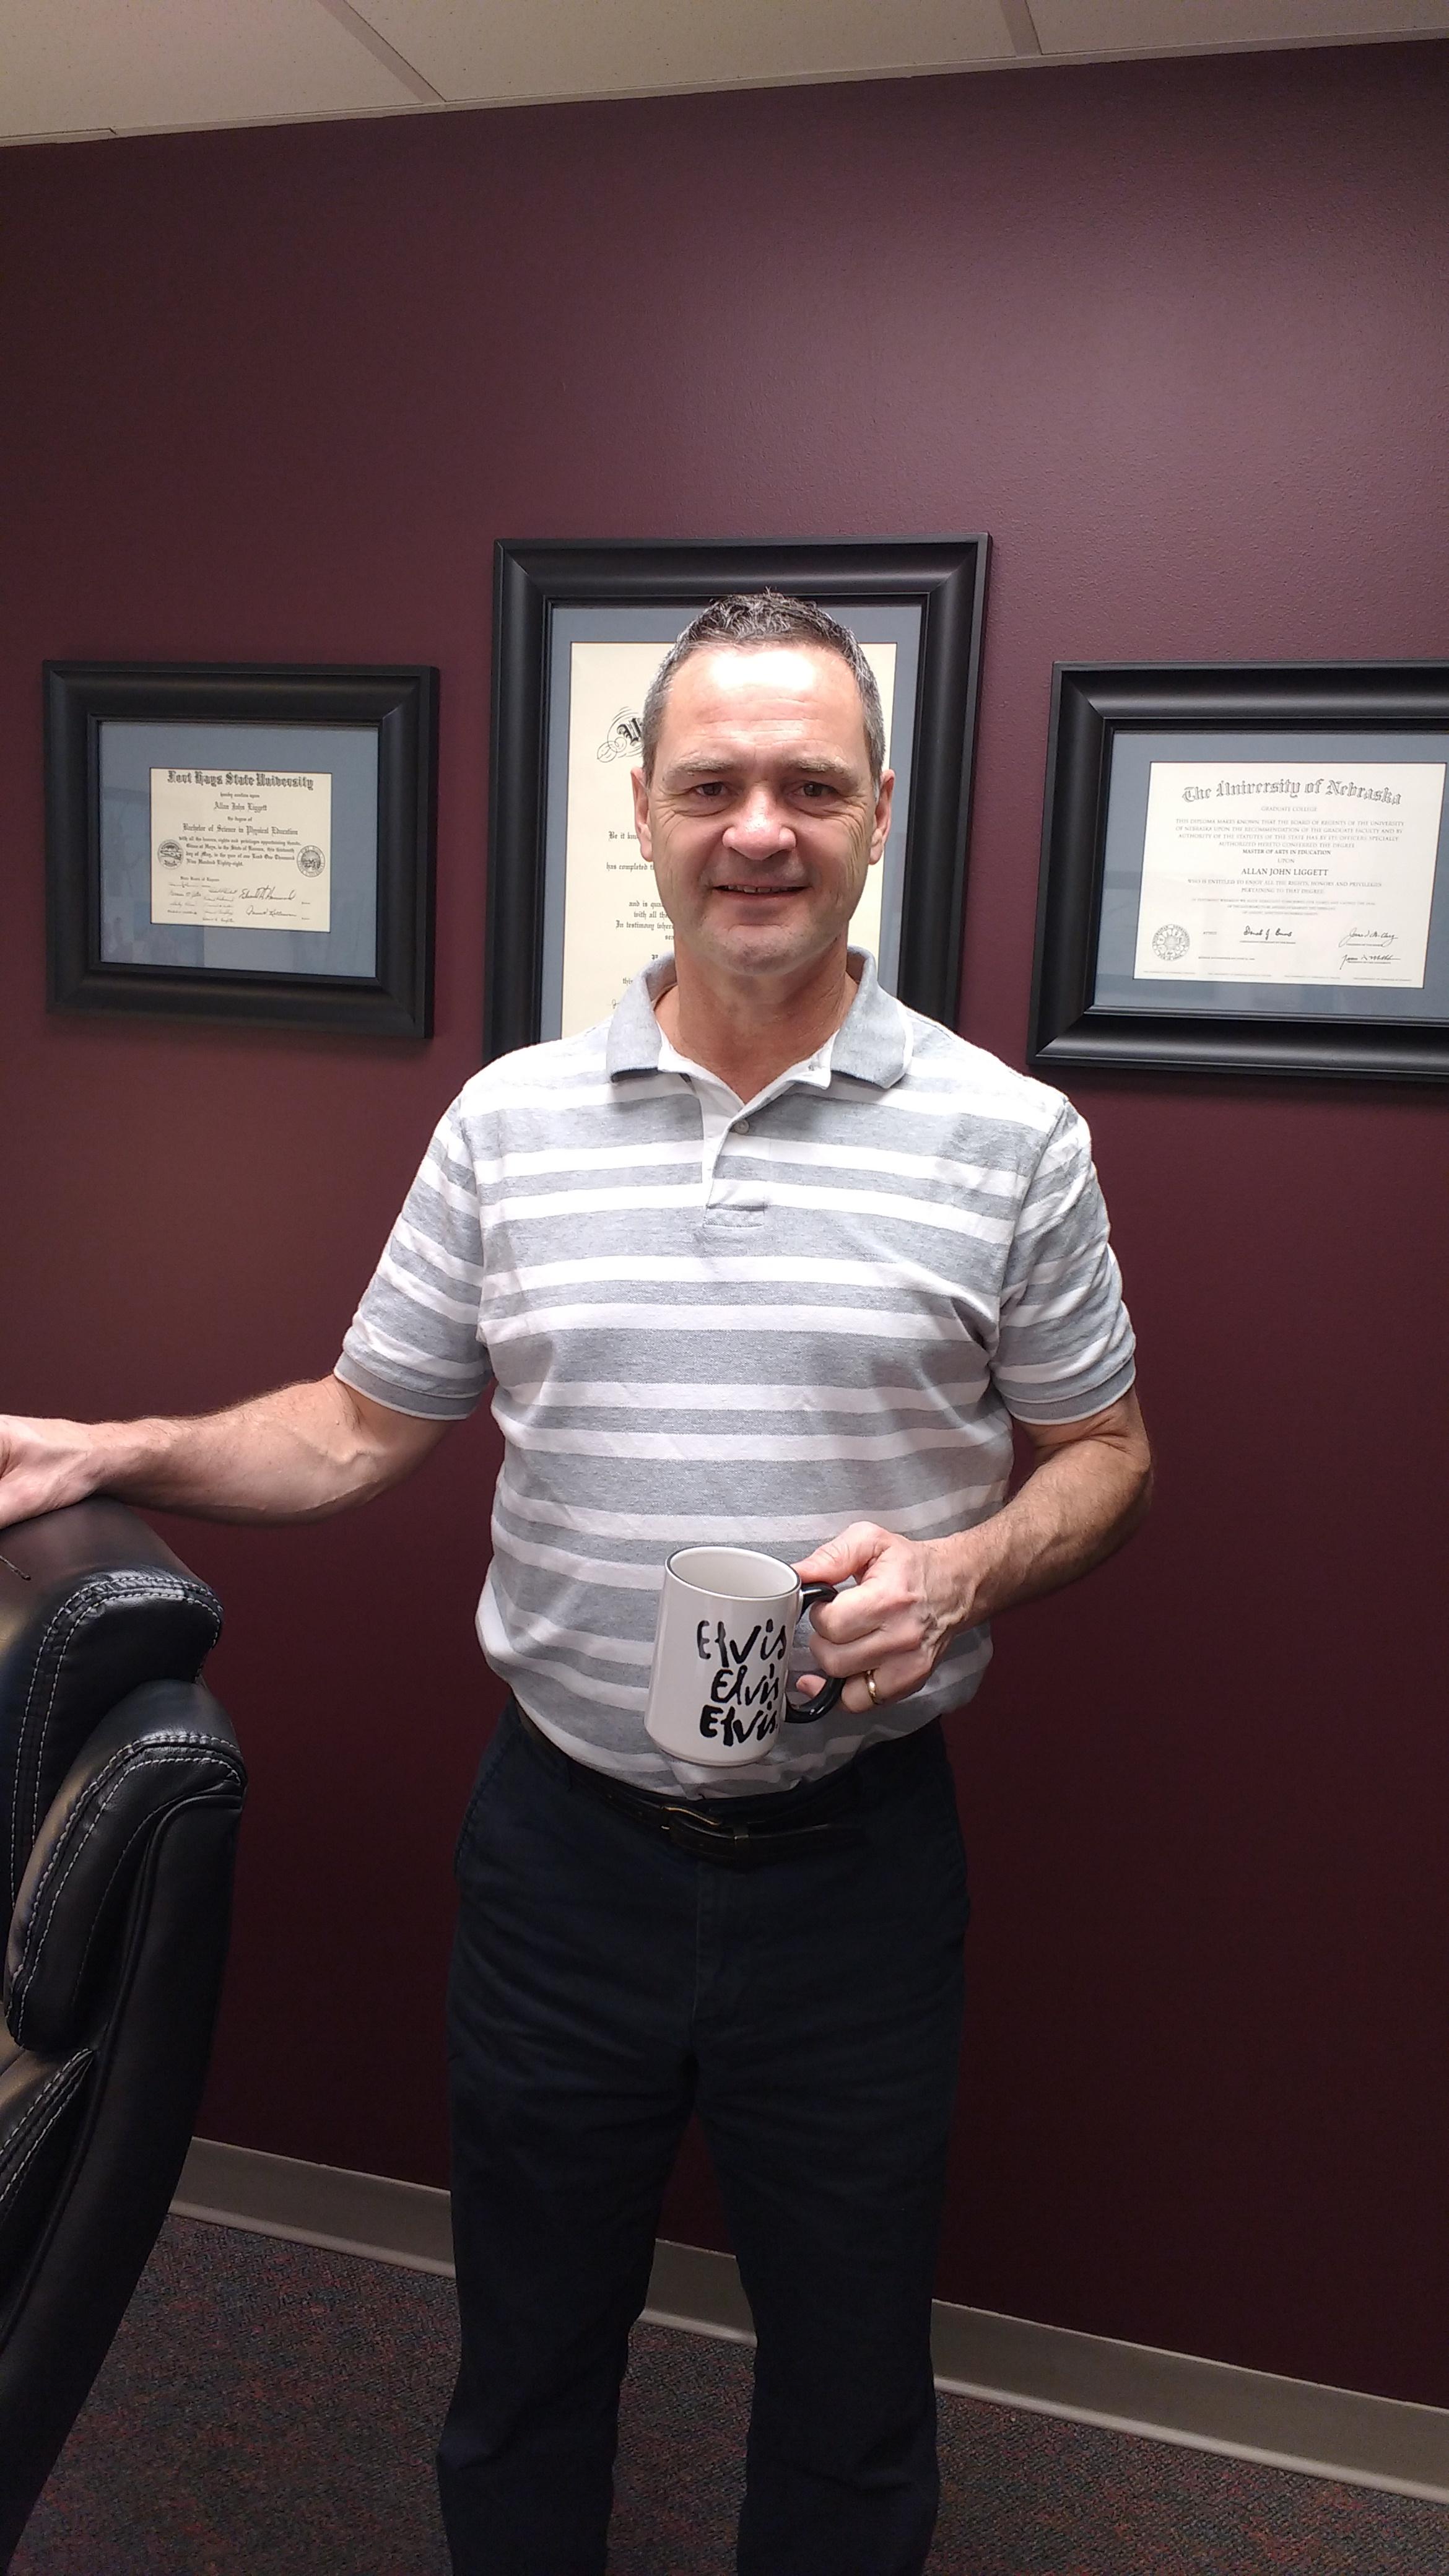 Congratulations Dr. Allan Liggett!